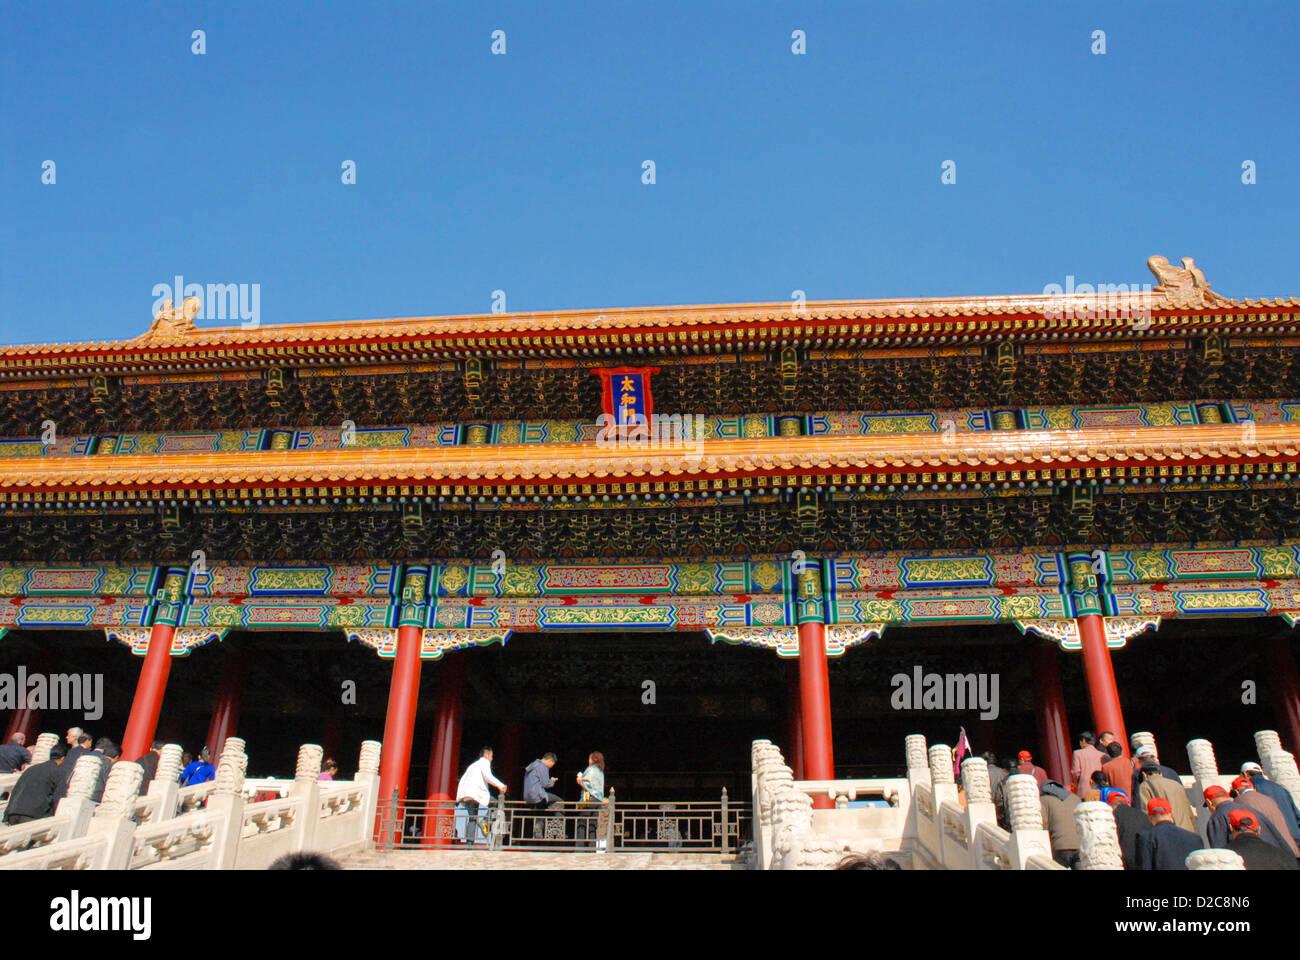 Detail, Gate Of Supreme Harmony, Forbidden City, Beijing, China - Stock Image